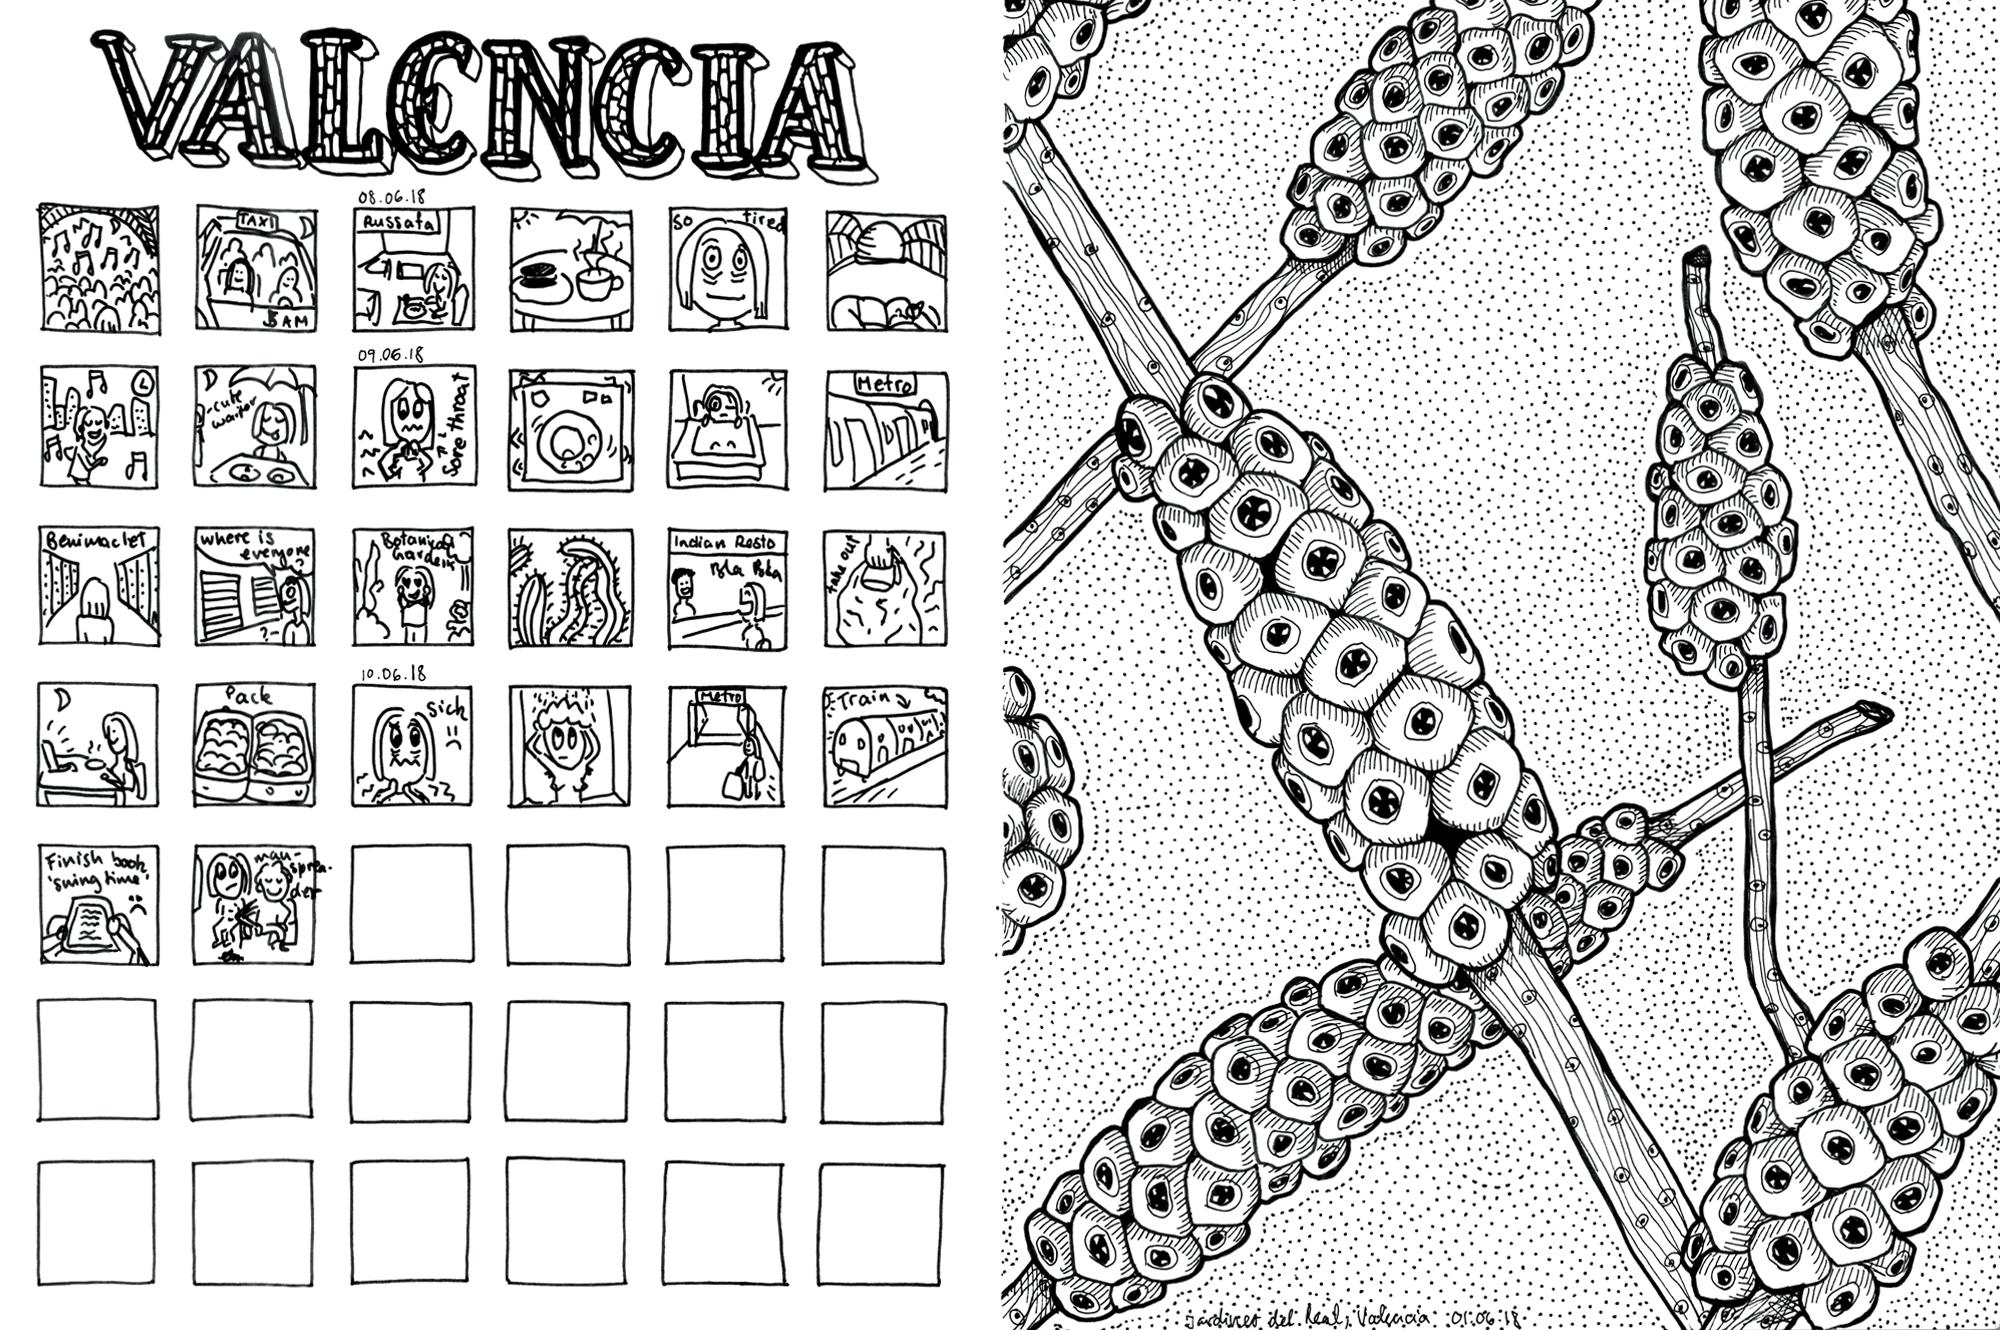 32_valencia_comic_plant_web.jpg